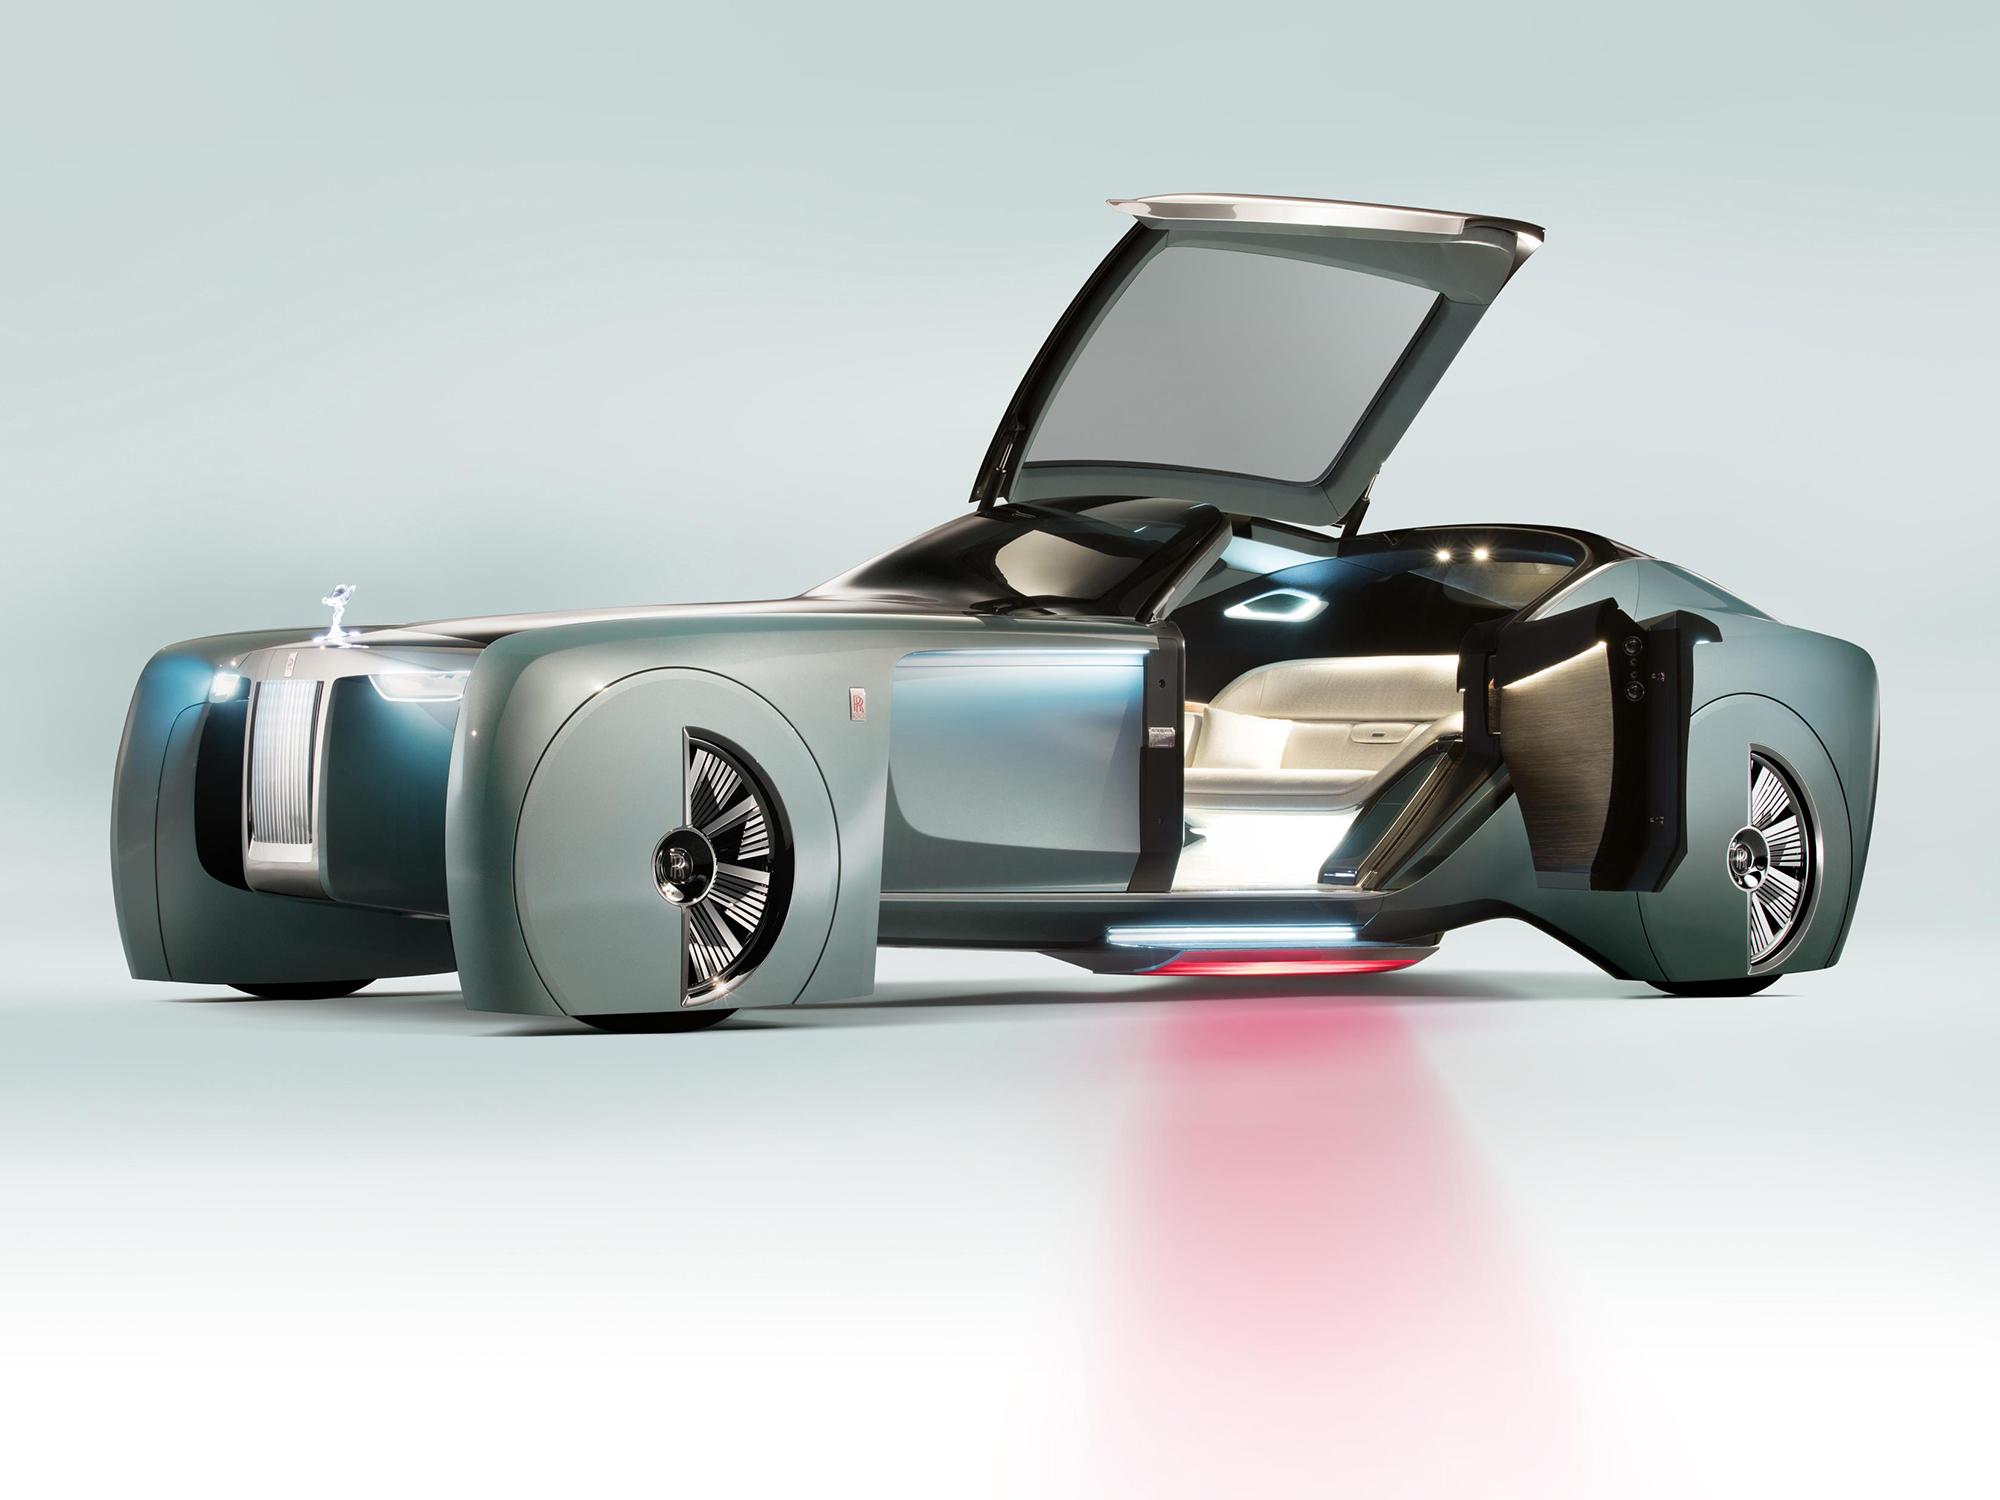 Rolls Royce Revela Luxuoso Carro Conceito Para Centenario Da Bmw Veja